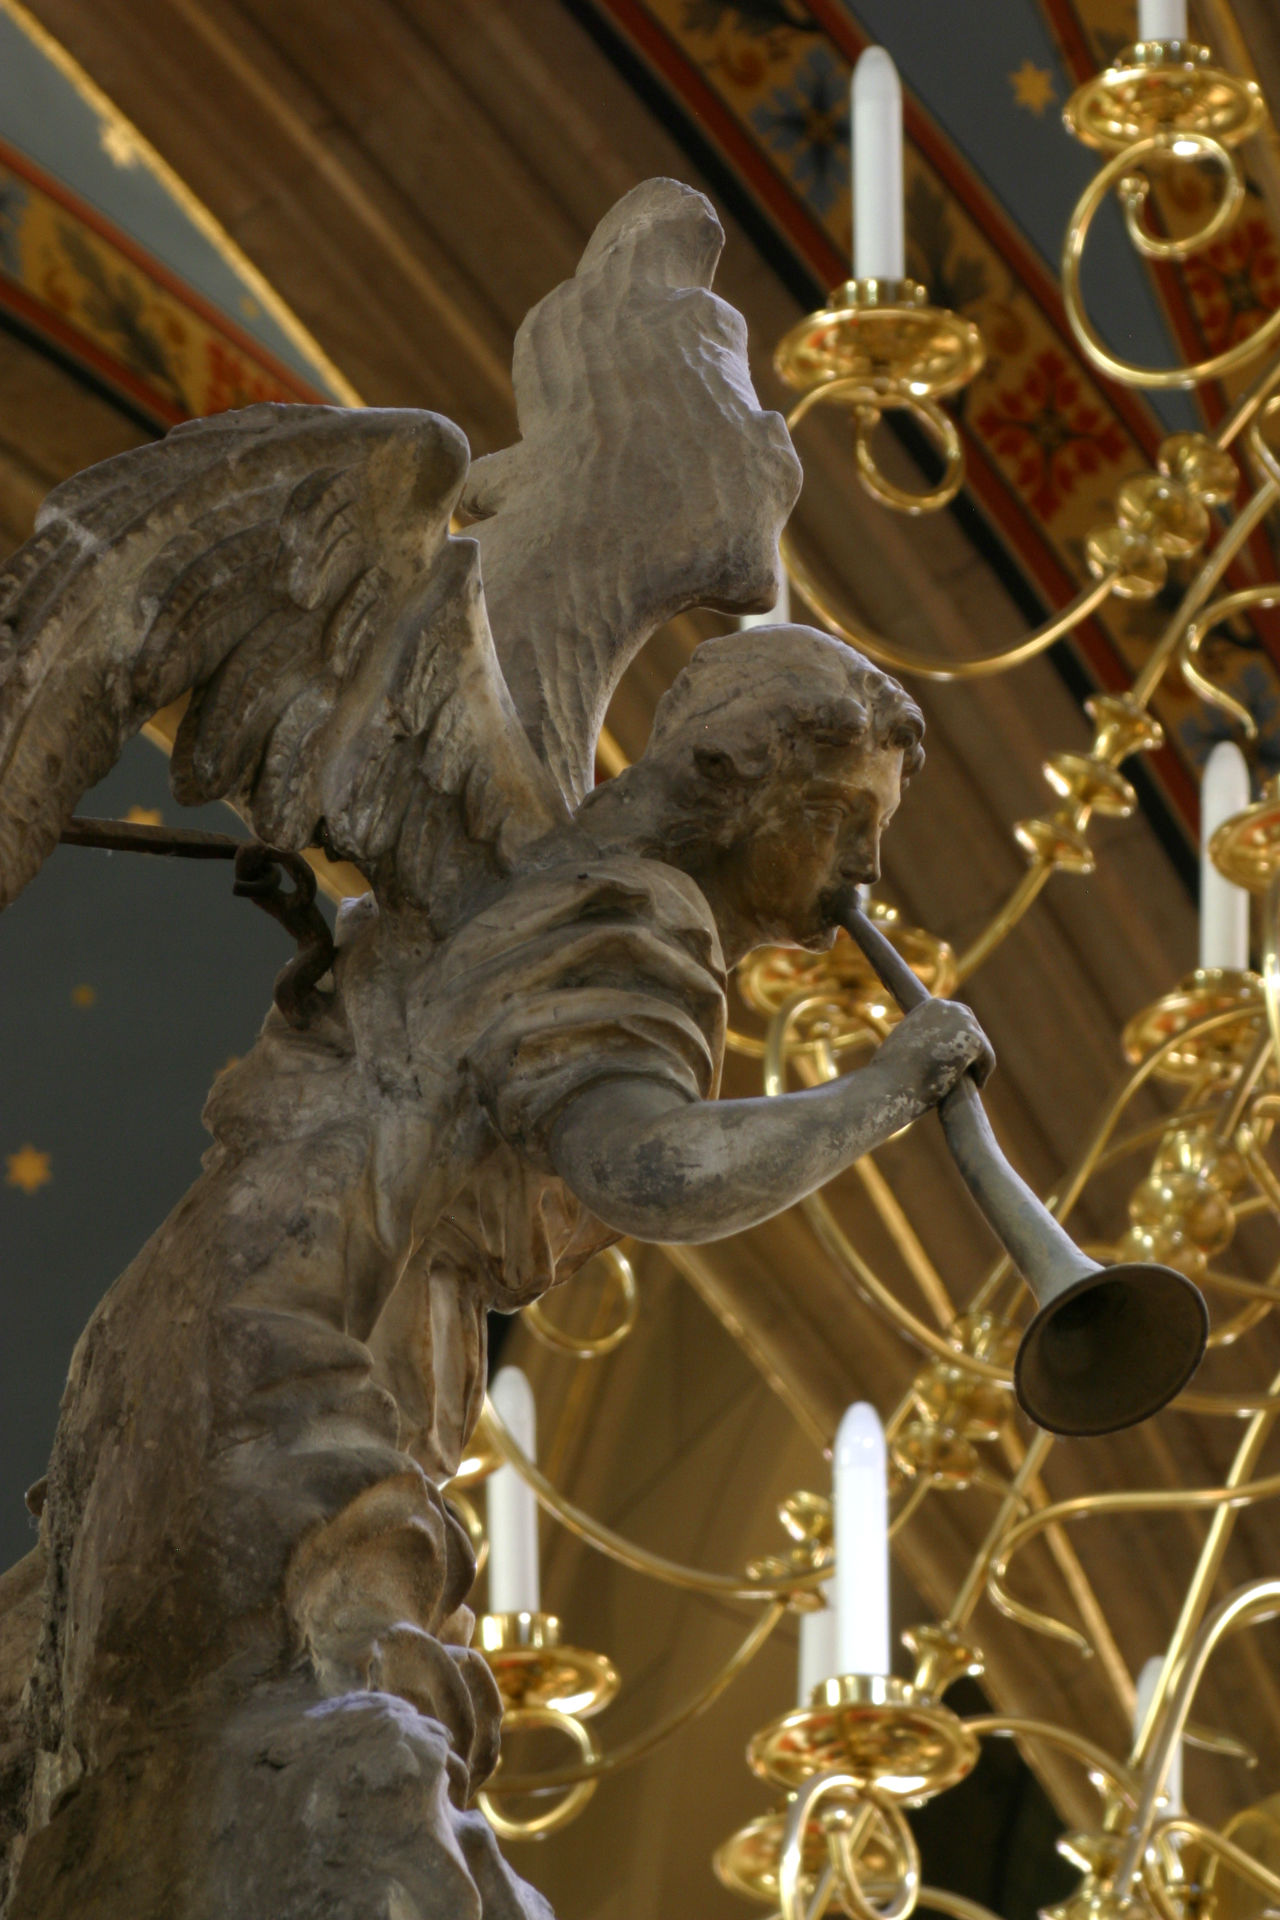 Angel musician Altar Angel Antique Art Belief Christianity .. Church Confession Croatia Europe Faith Gold Gospel Historical Holy Music Old Pray Religion Religious  Saint Sculpture Spirituality Statue Worship